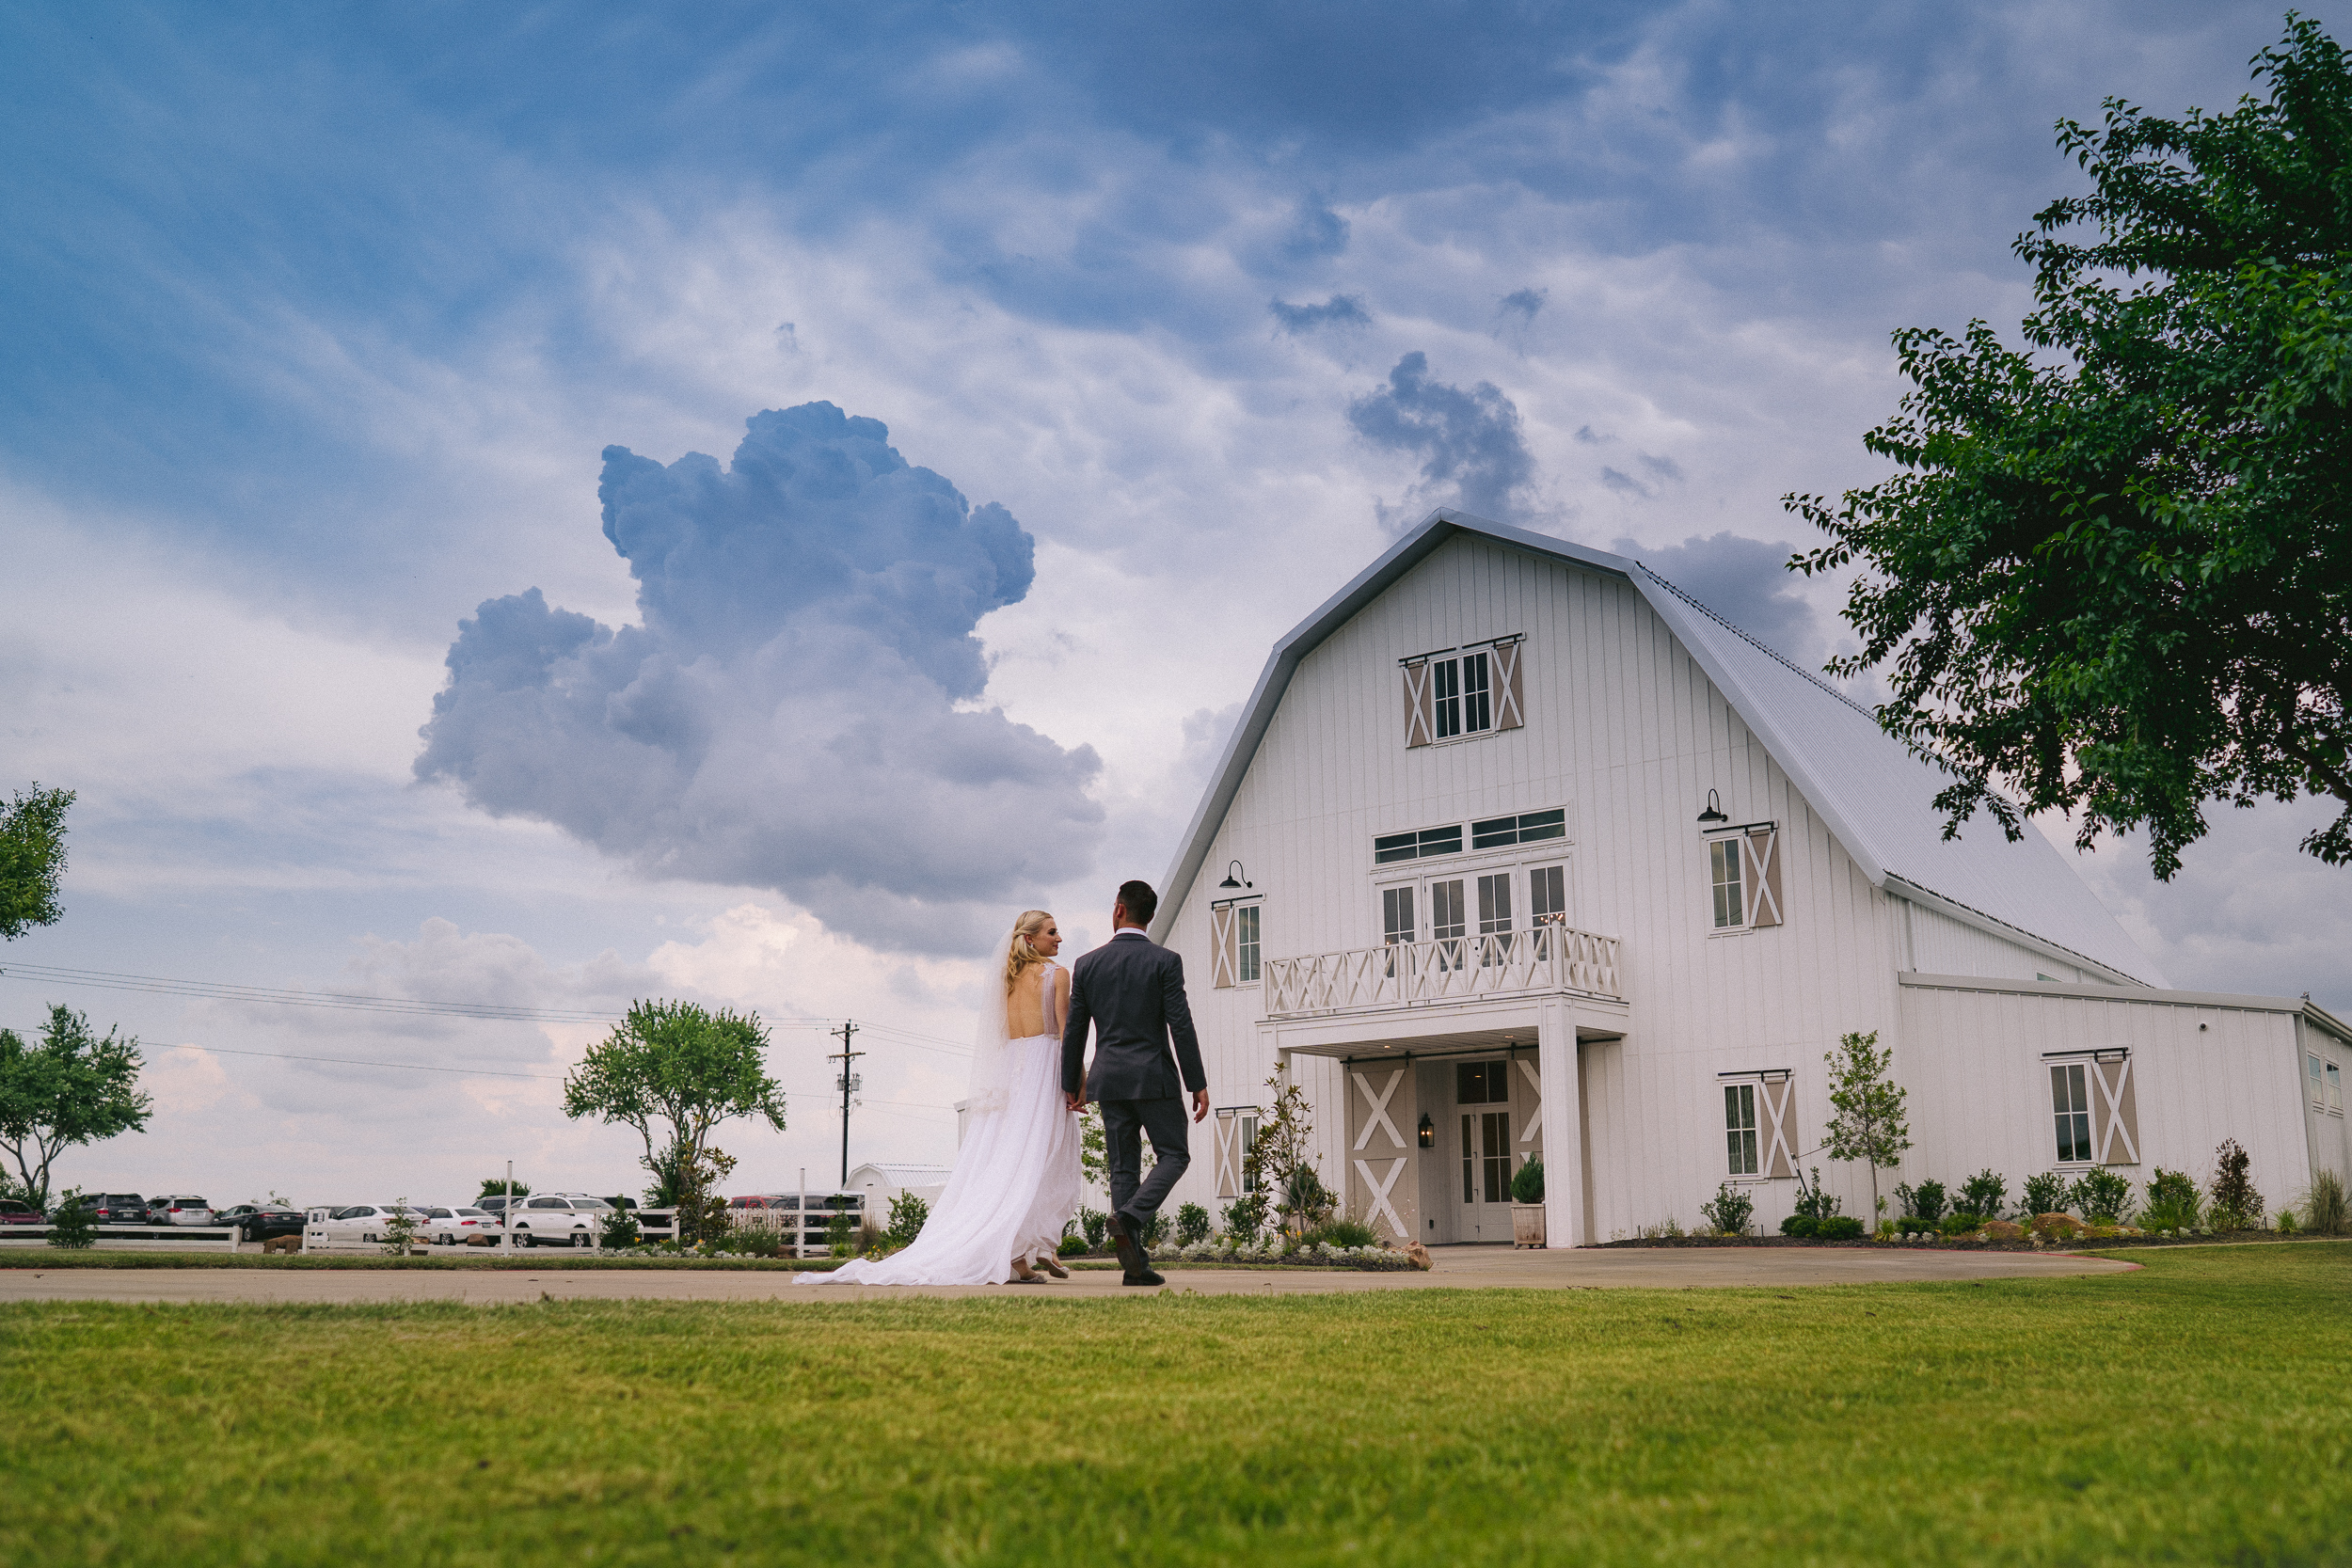 engagement-wedding-photographer-Dallas-After-2.jpg